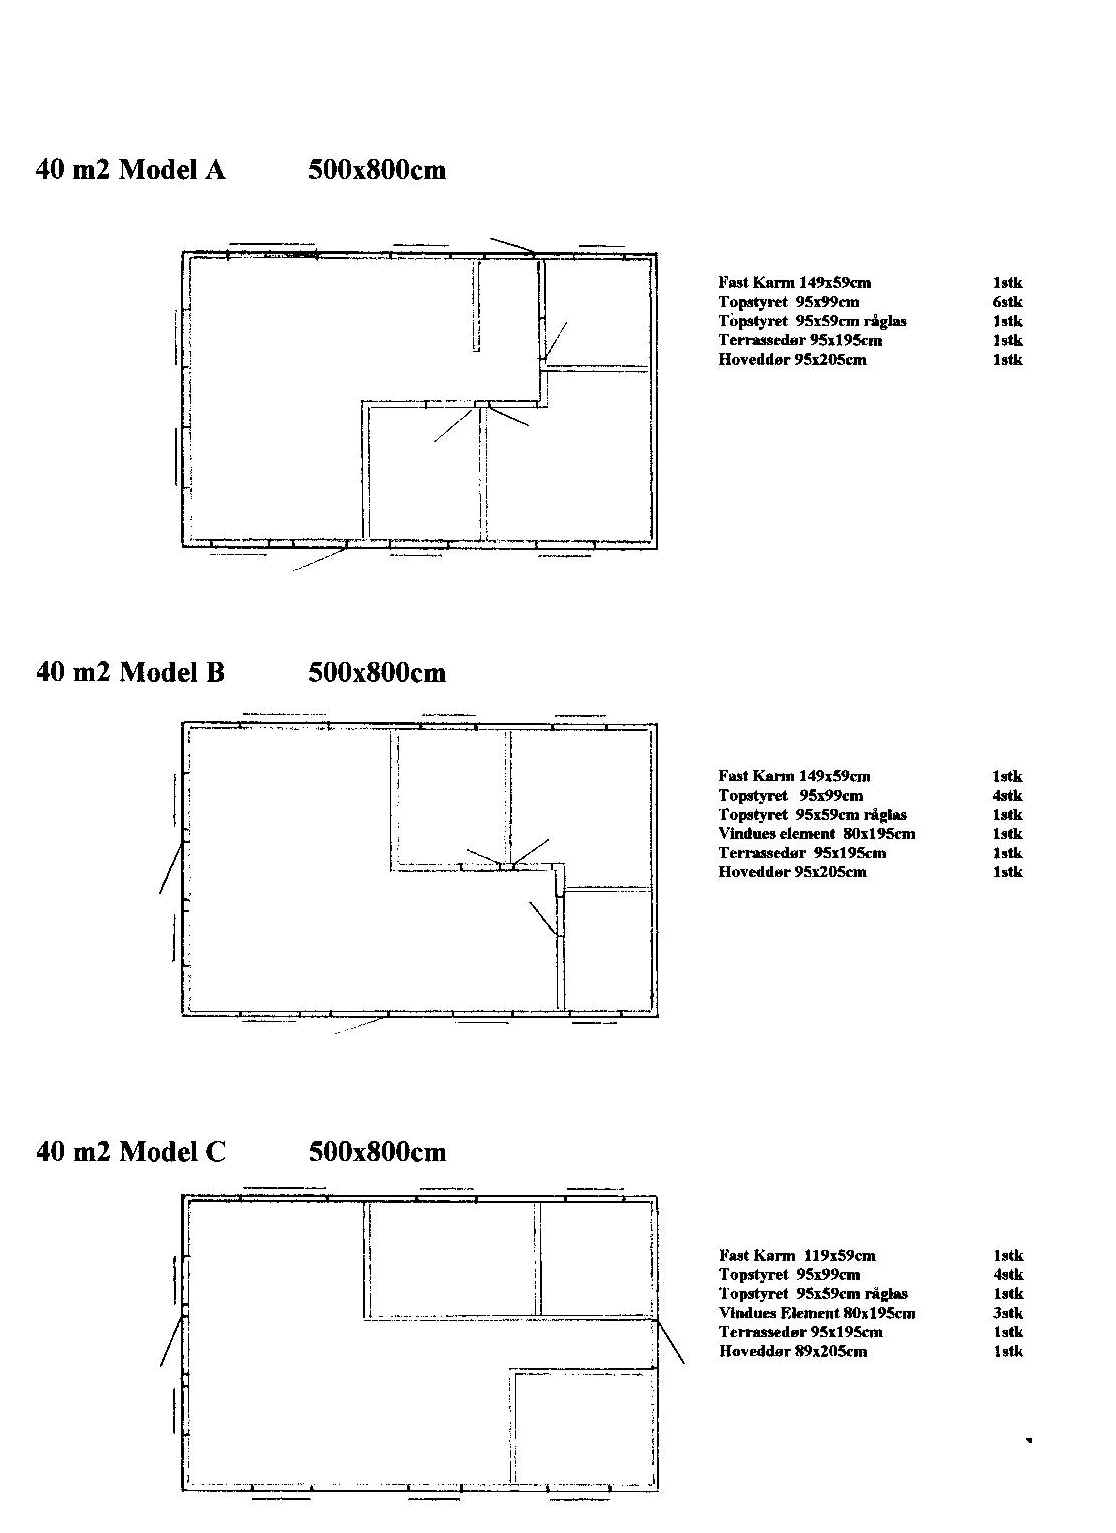 40m2special-grundplan